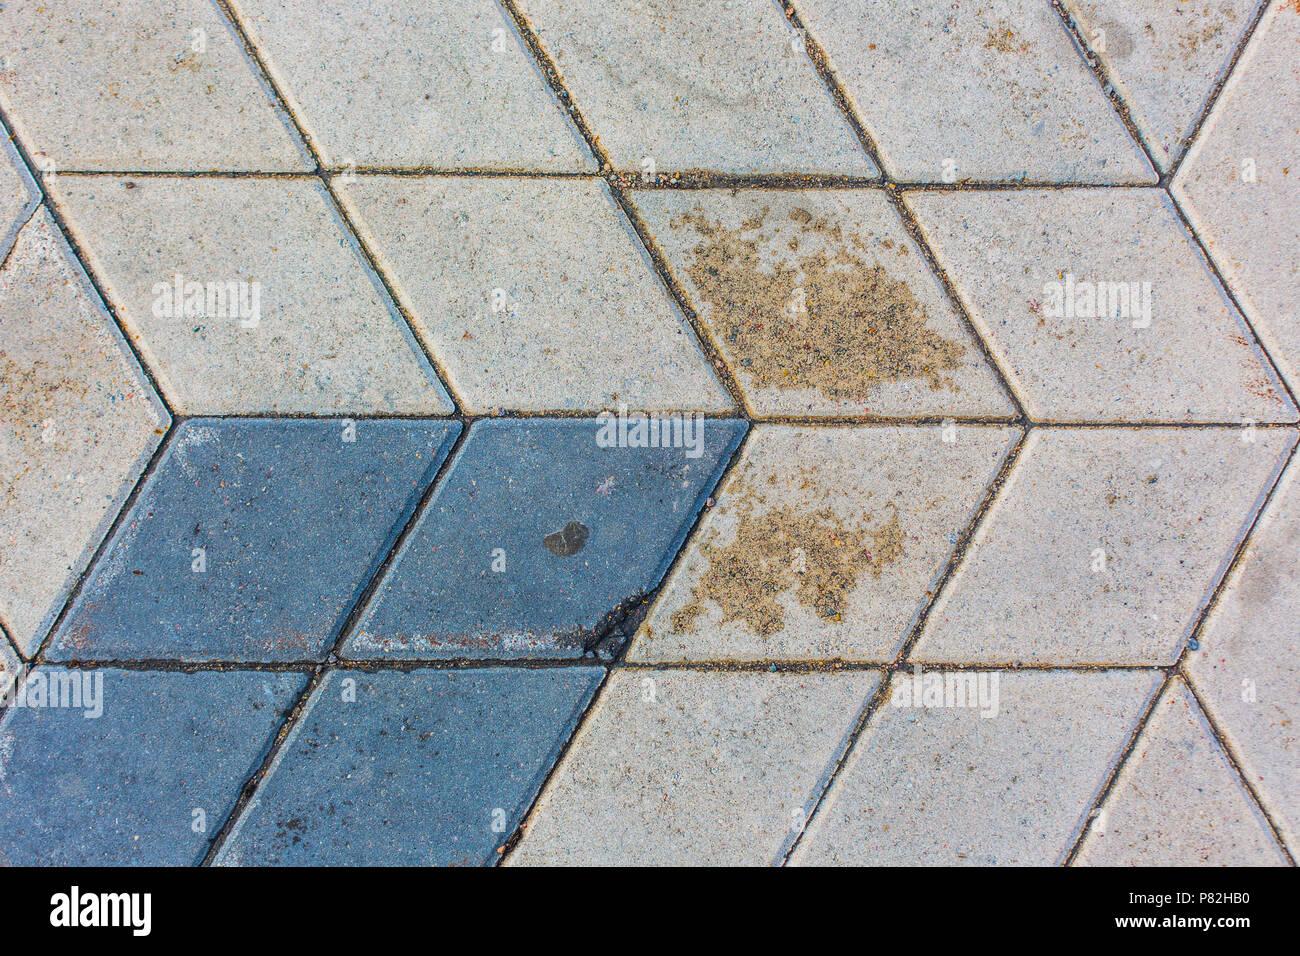 rhombus concrete tiles pattern texture background Stock Photo ...